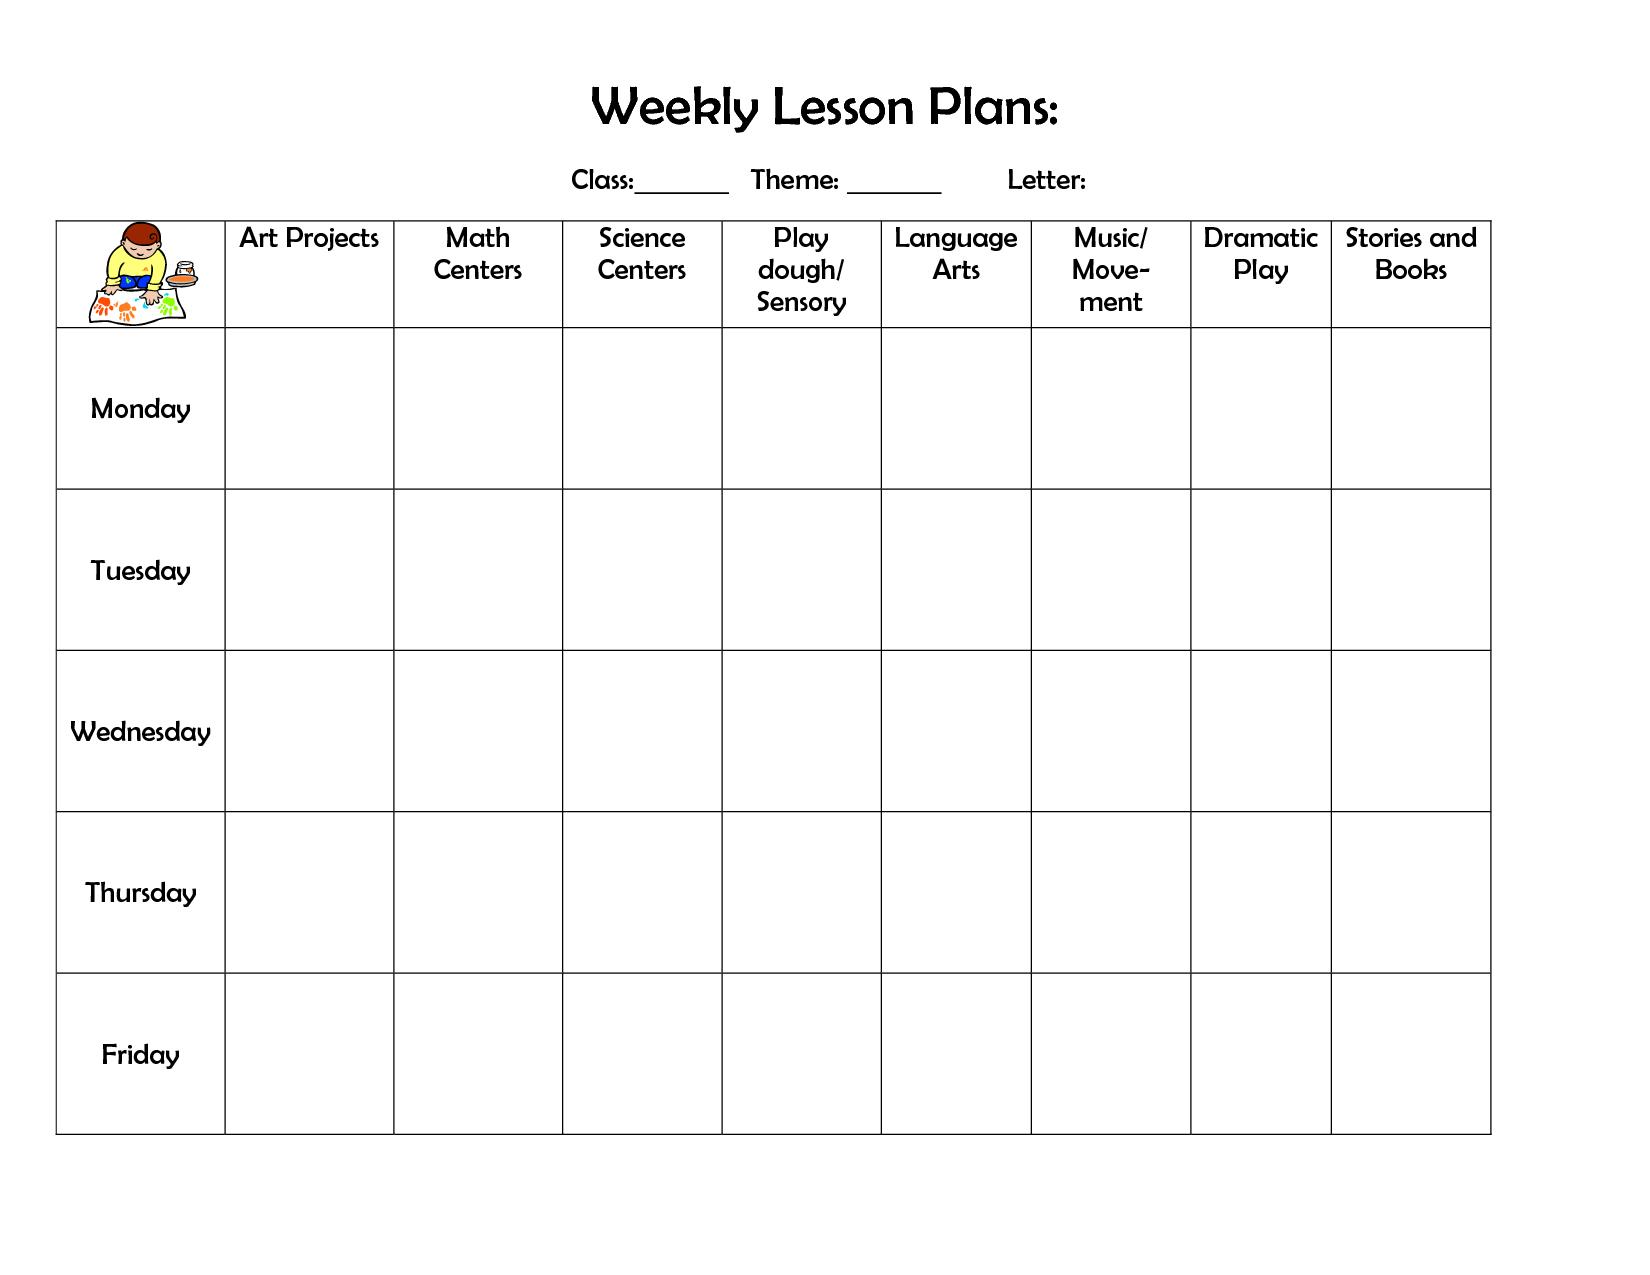 002 Free Preschool Weekly Lesson Plan Template Top Templates inside Free Preschool Template For Schedule